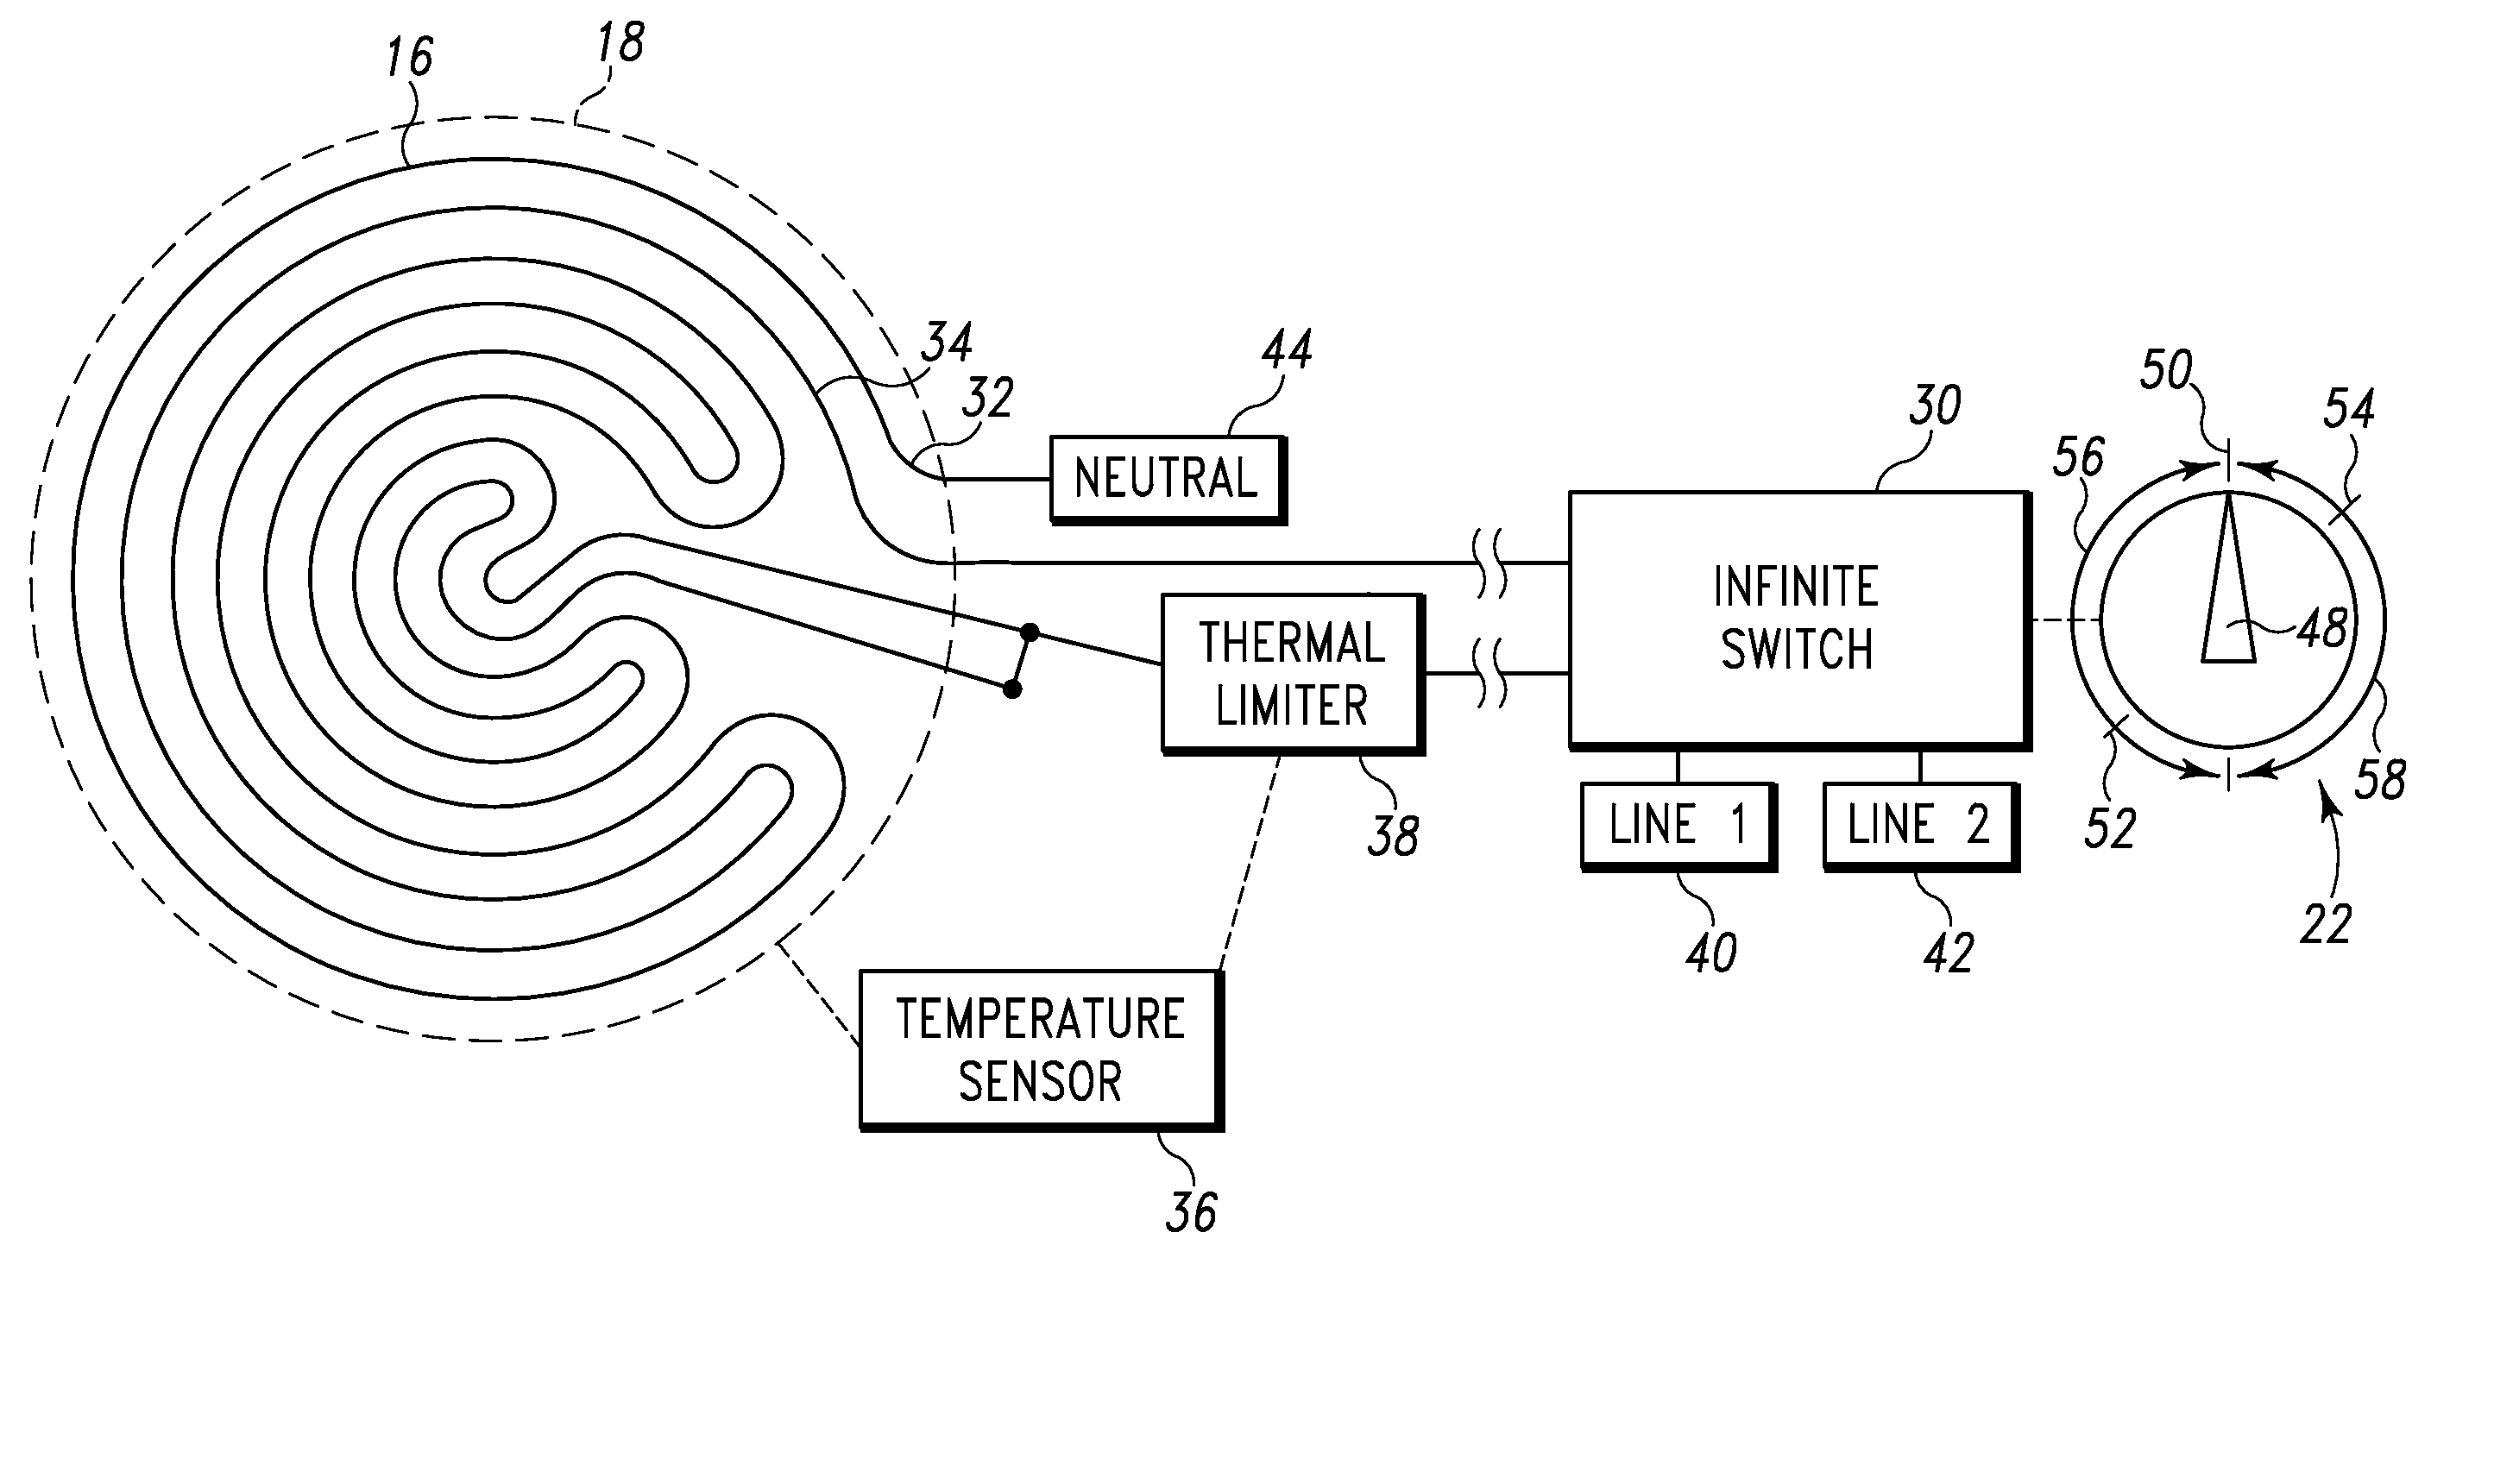 robertshaw infinite switch wiring diagram